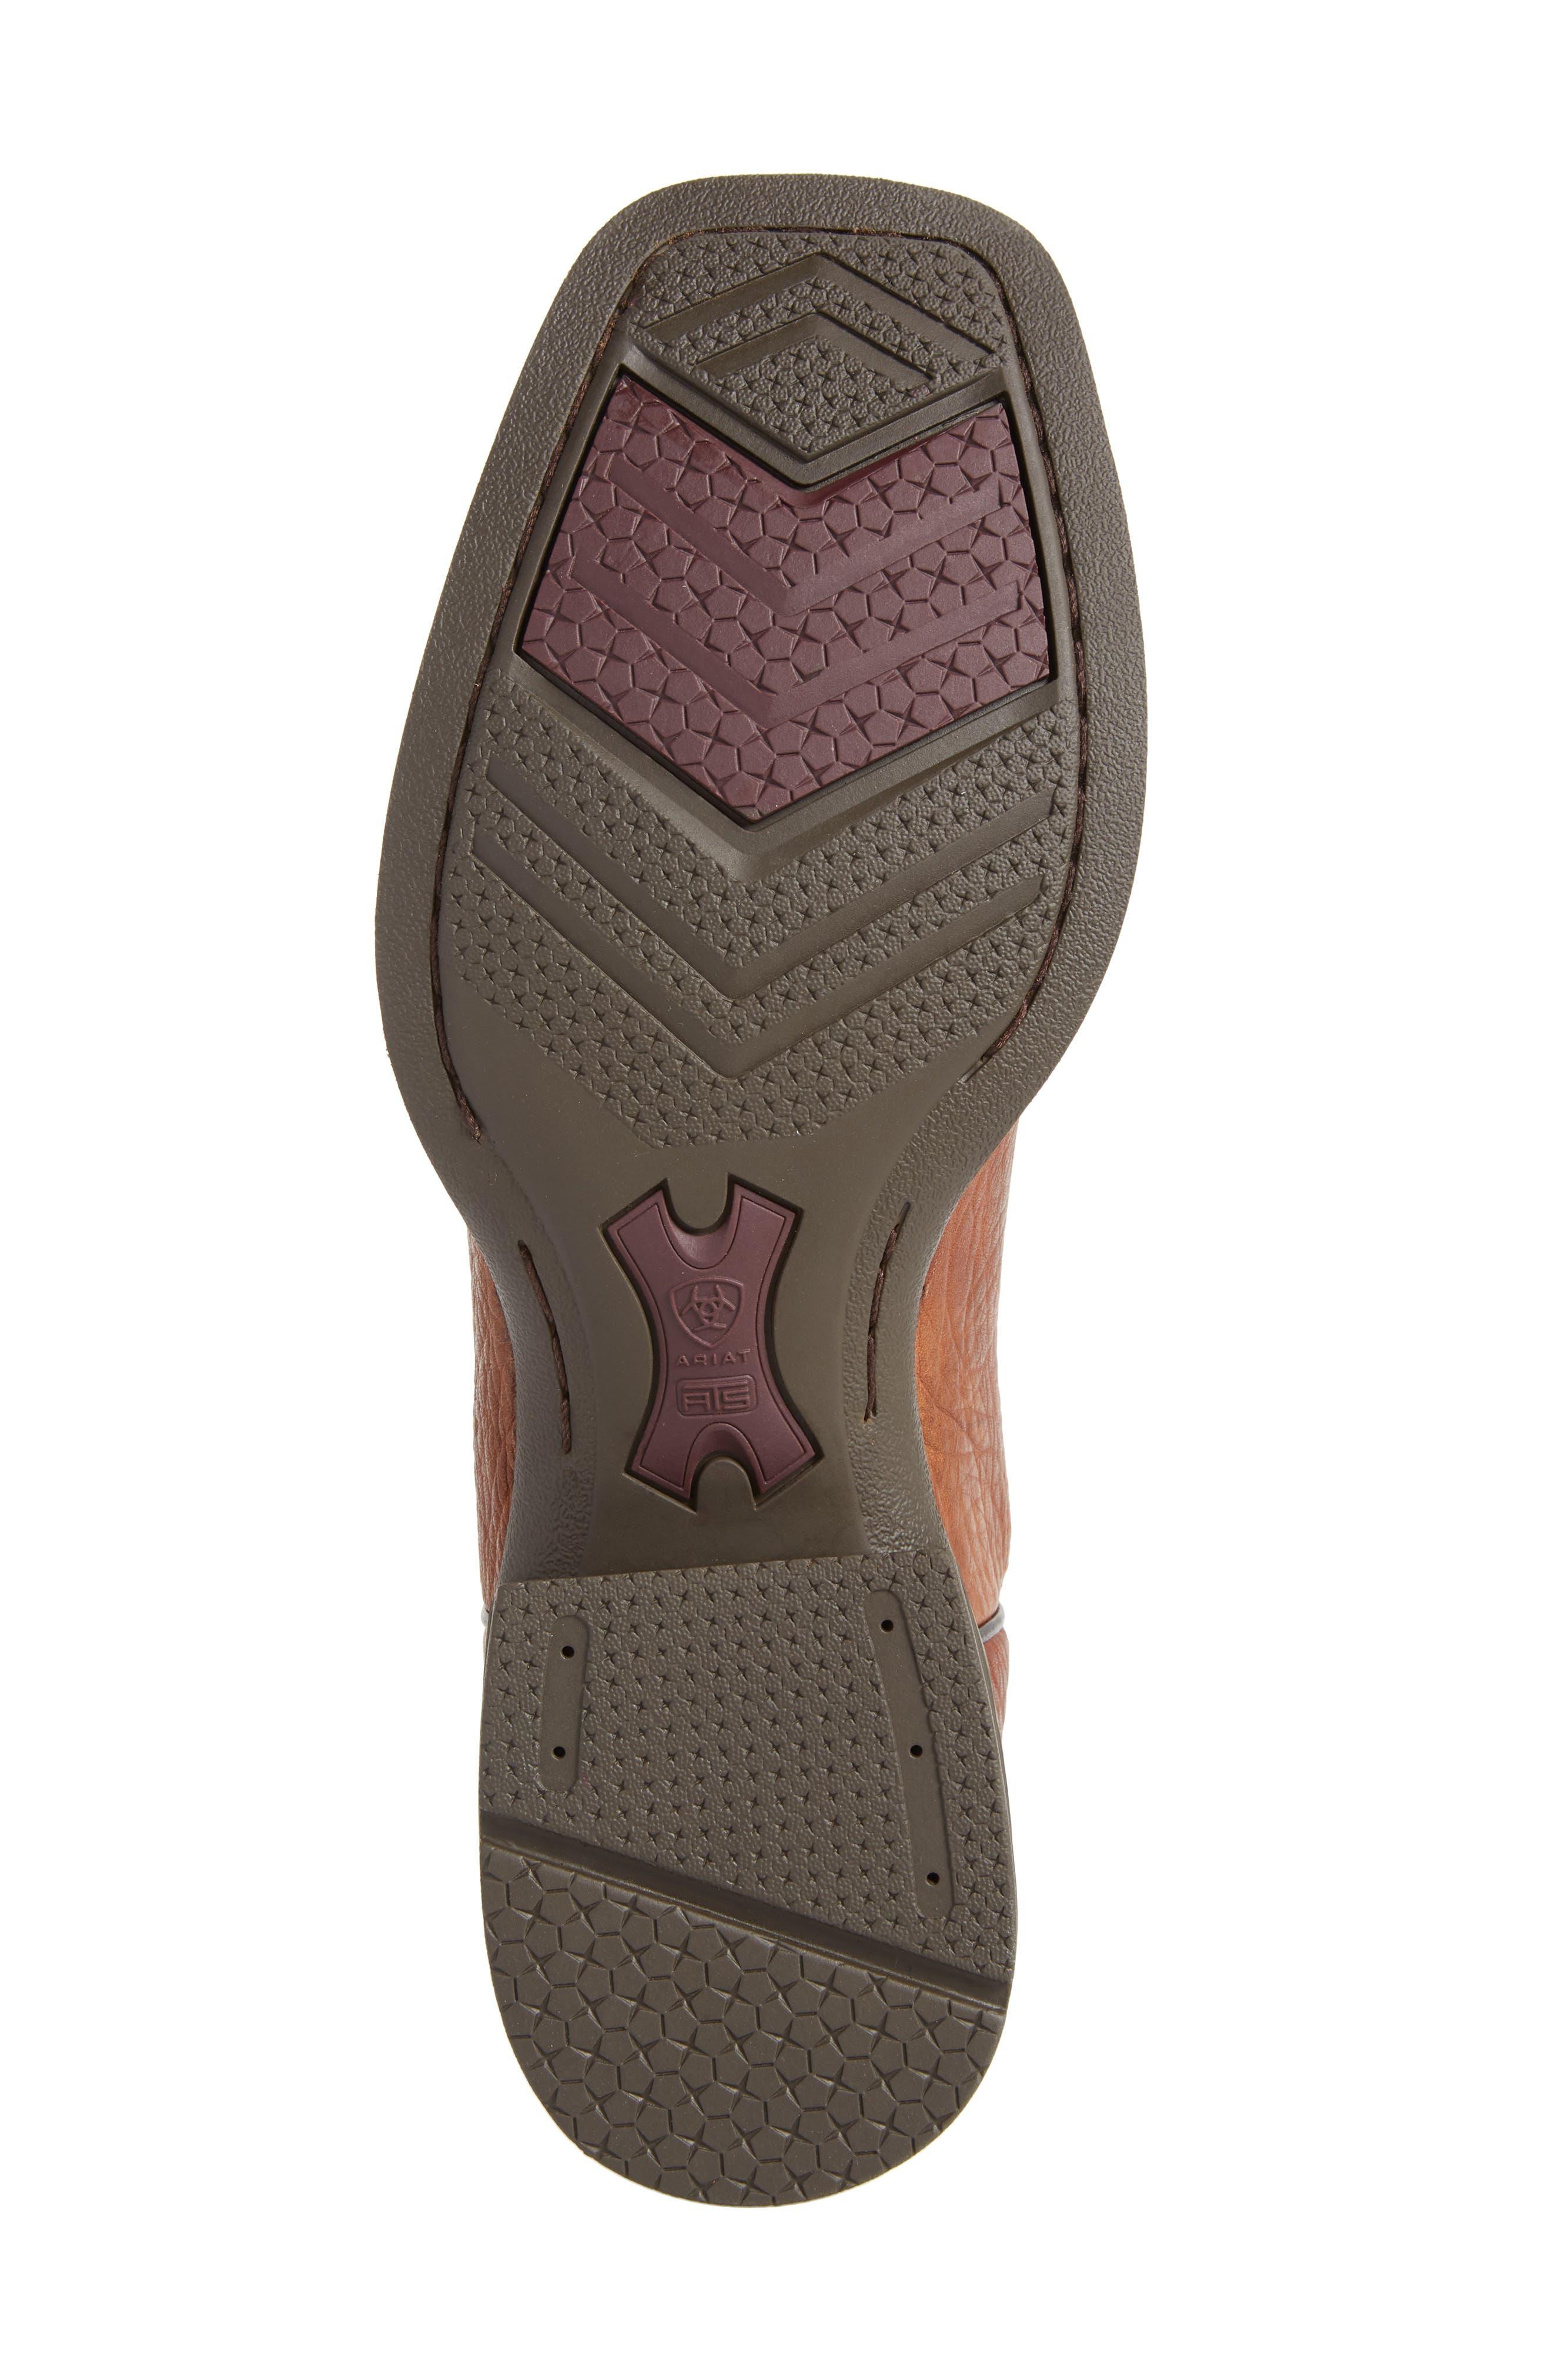 Heritage Latigo Square Toe Cowboy Boot,                             Alternate thumbnail 6, color,                             COGNAC/ BROWN BOMBER LEATHER